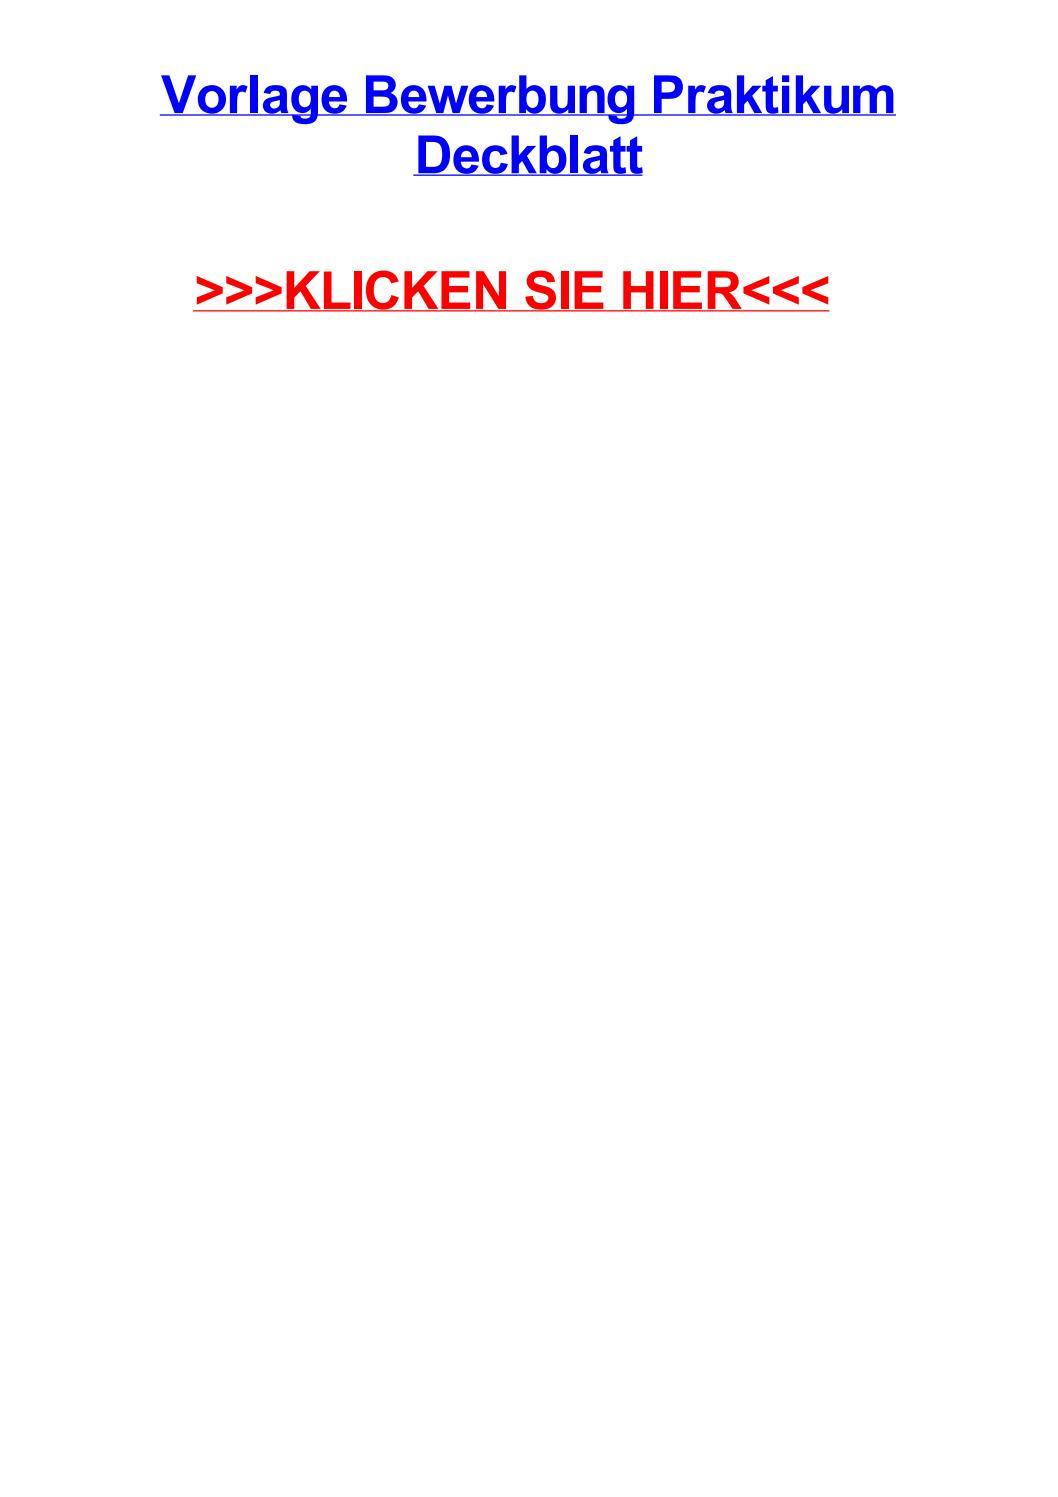 Praktikumsbericht Deckblatt Praktikumsberichte